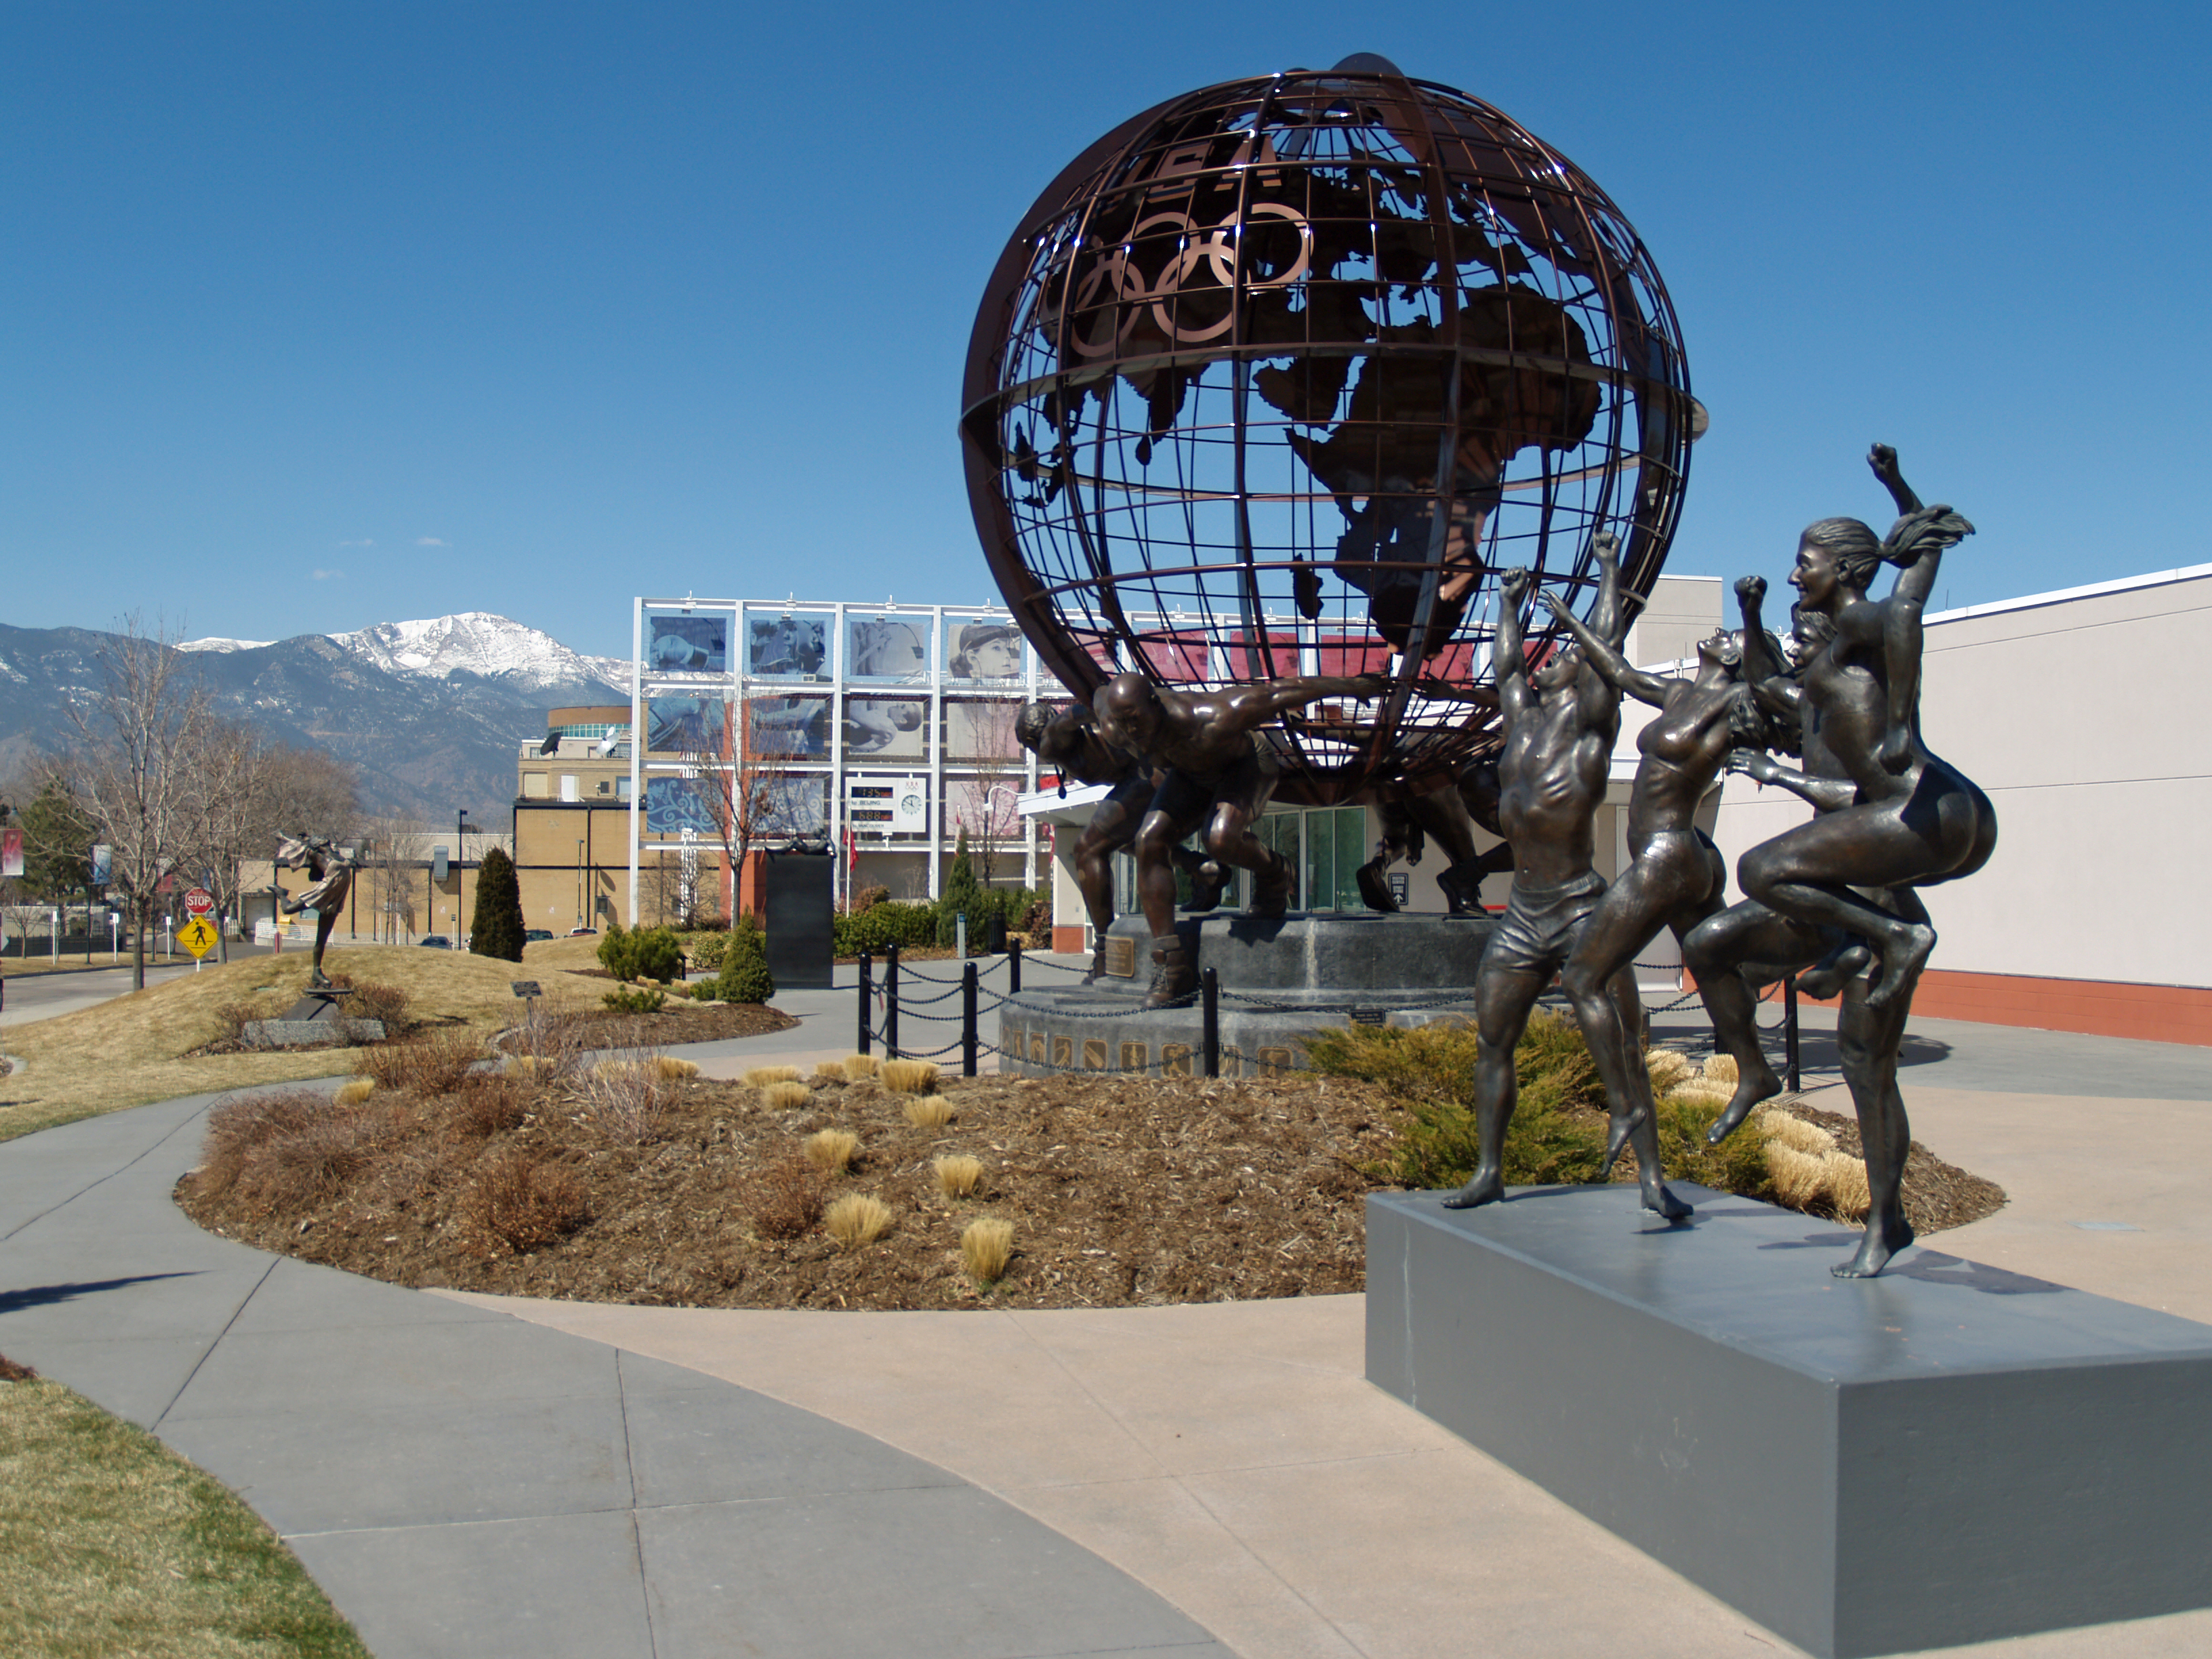 U.S. Olympic Committee headquarters in [[Colorado Springs, Colorado